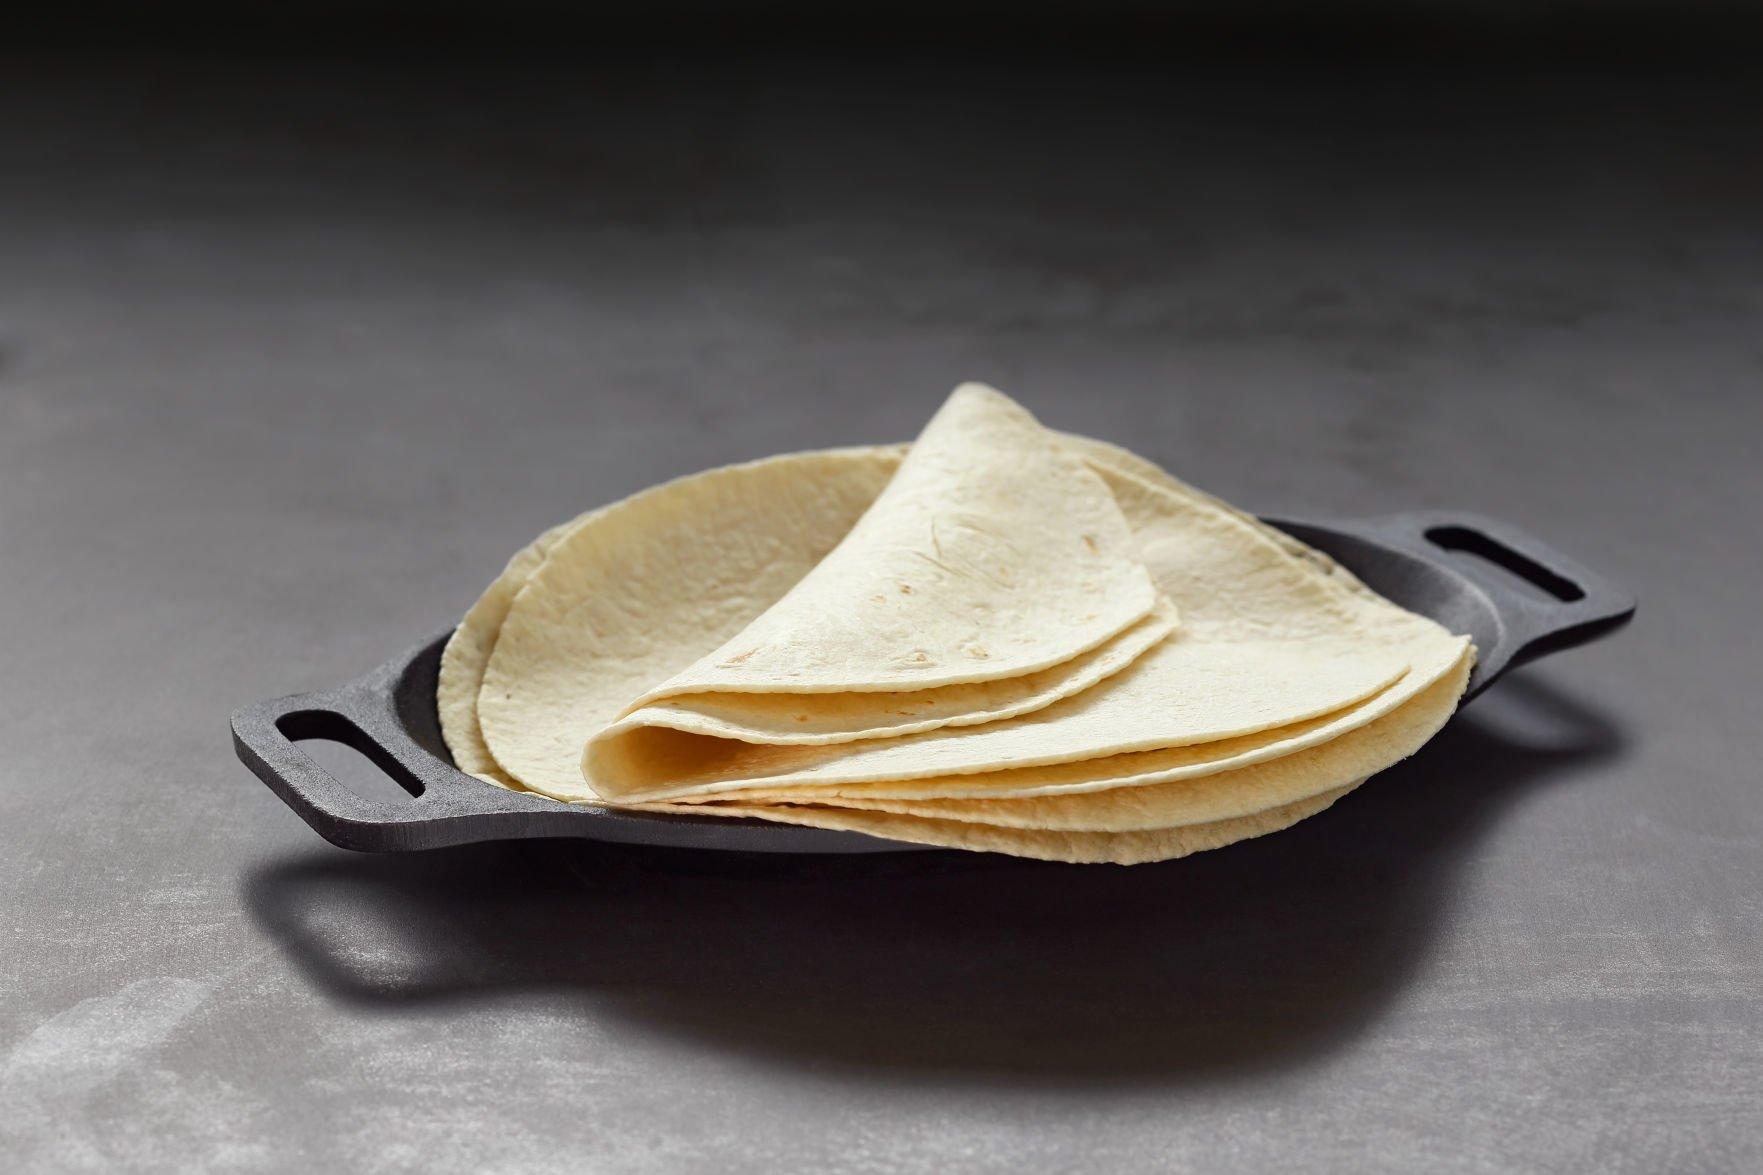 Fresca Mexican Foods opens new Caldwell facility   Idaho Press